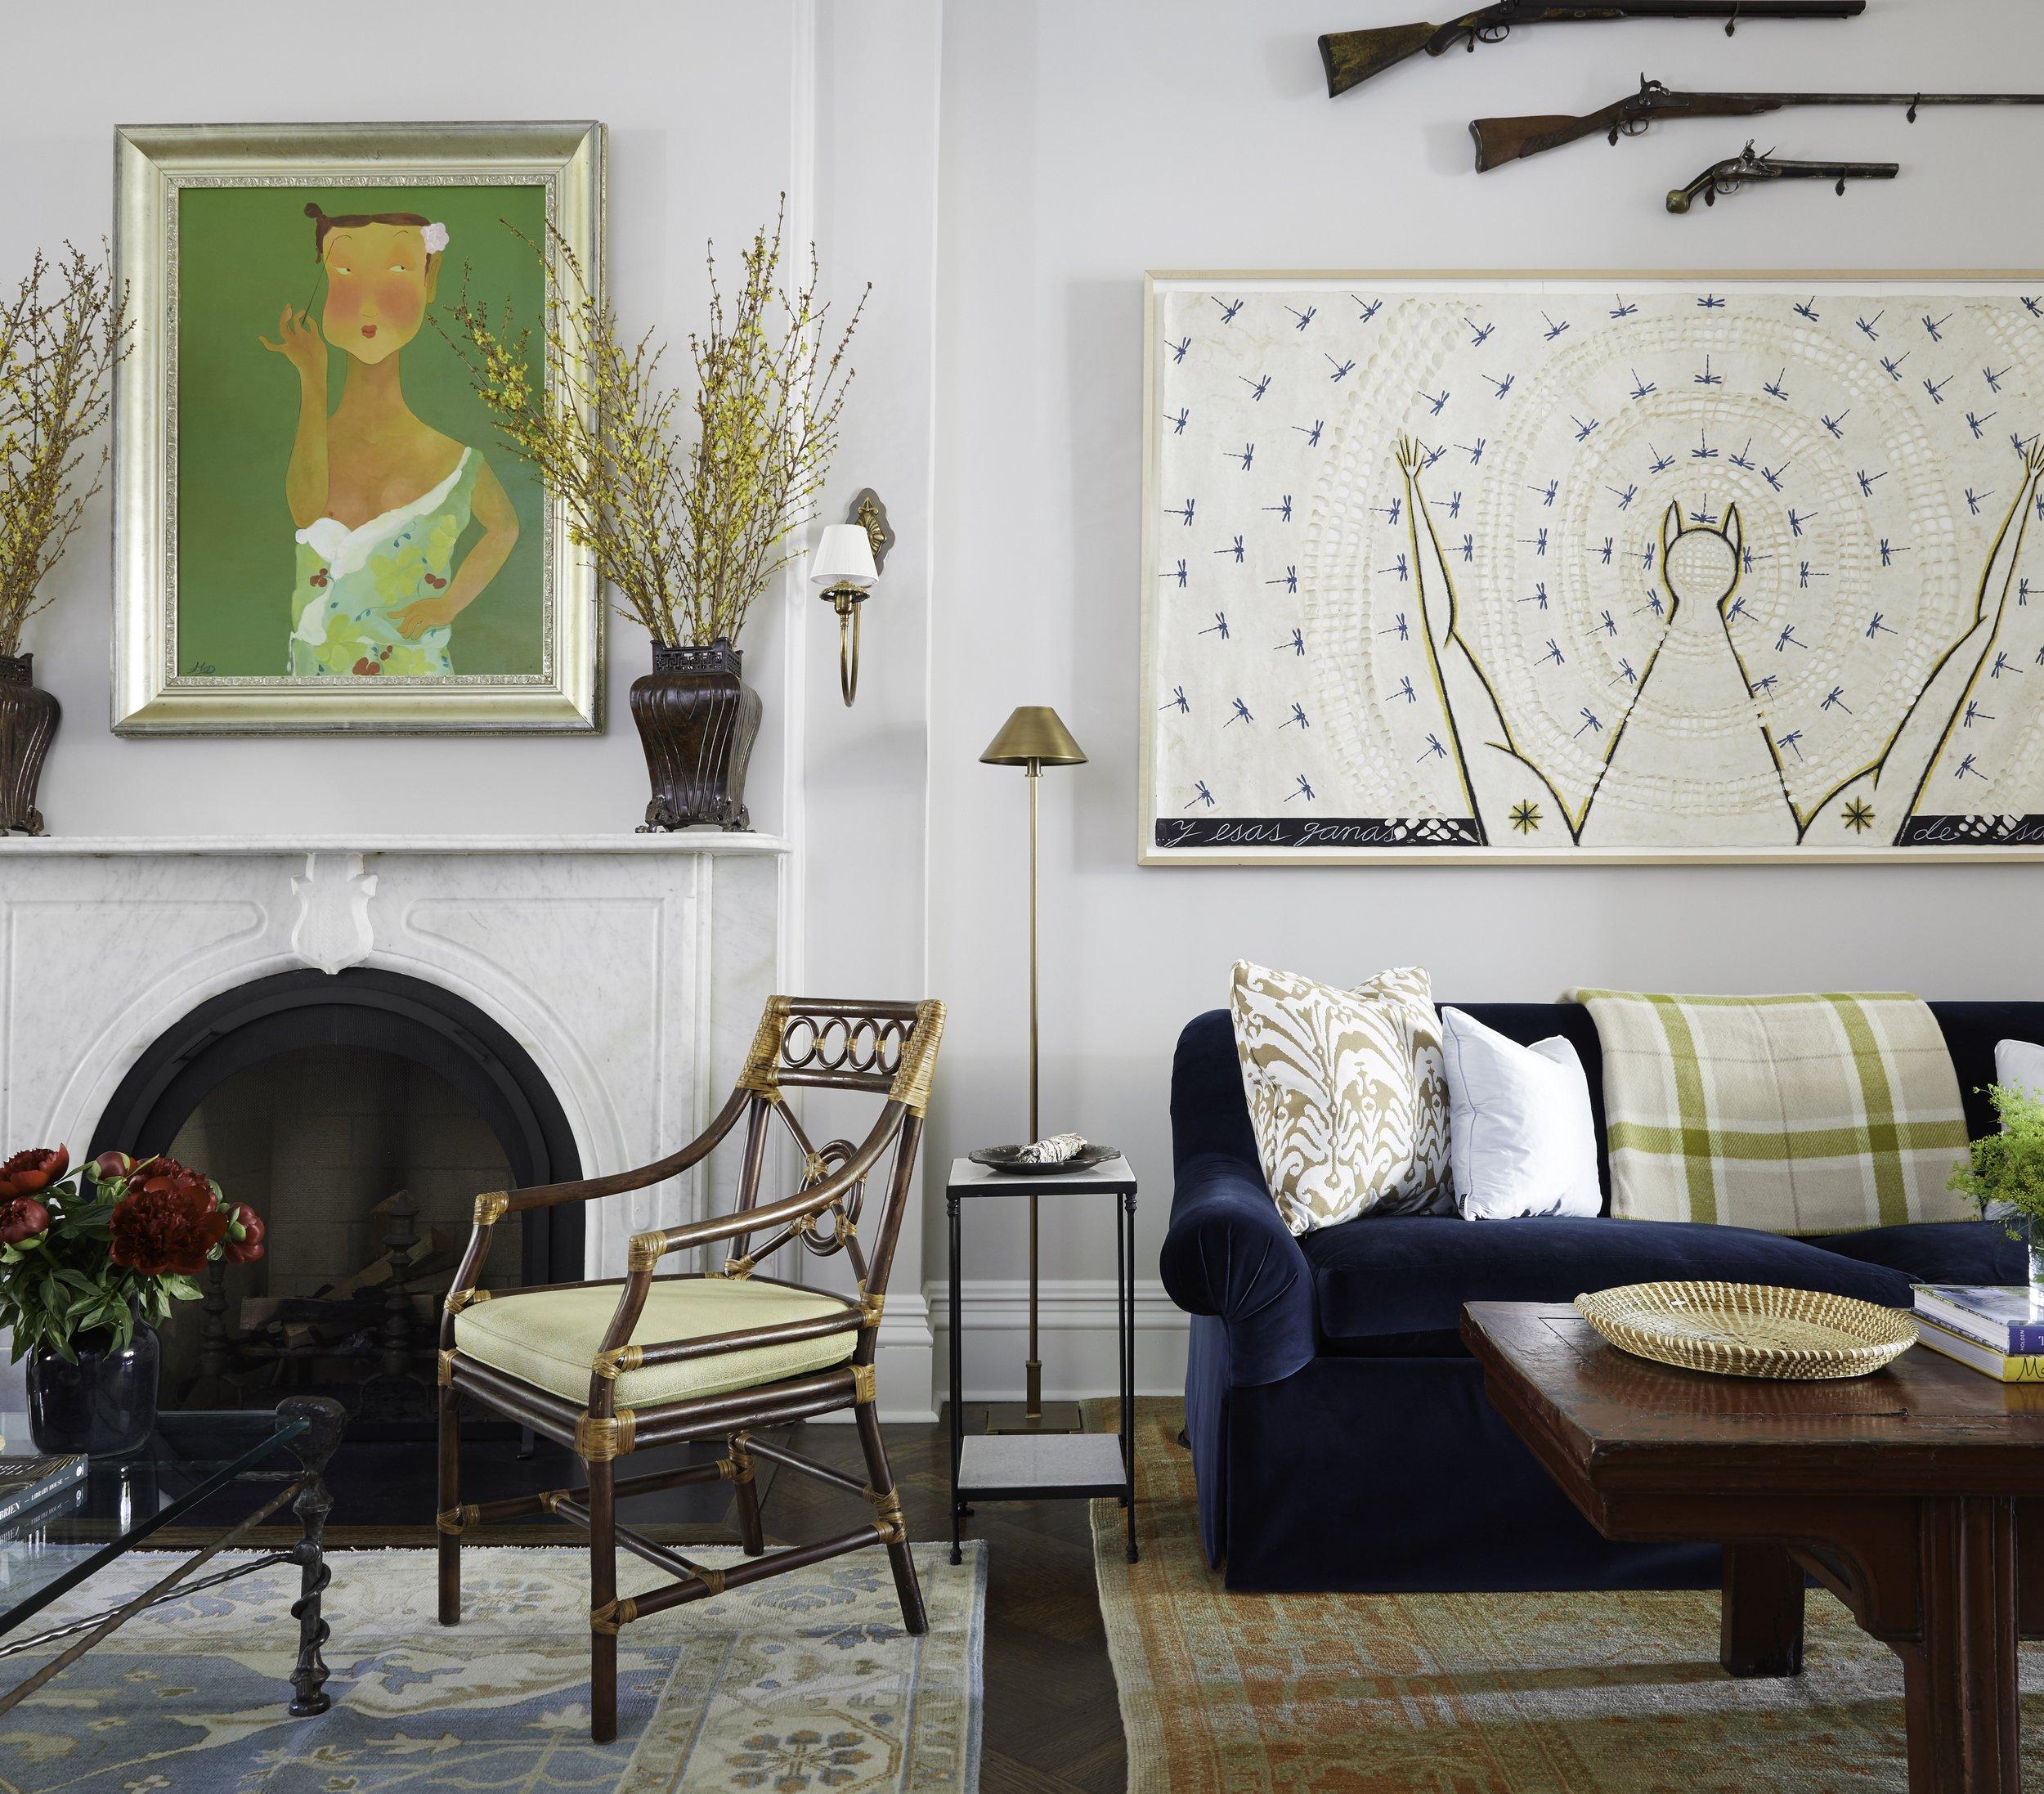 LAVA-interiors-Brooklyn-Brownstone-parlor-living-room-nyc-interior-design.jpg